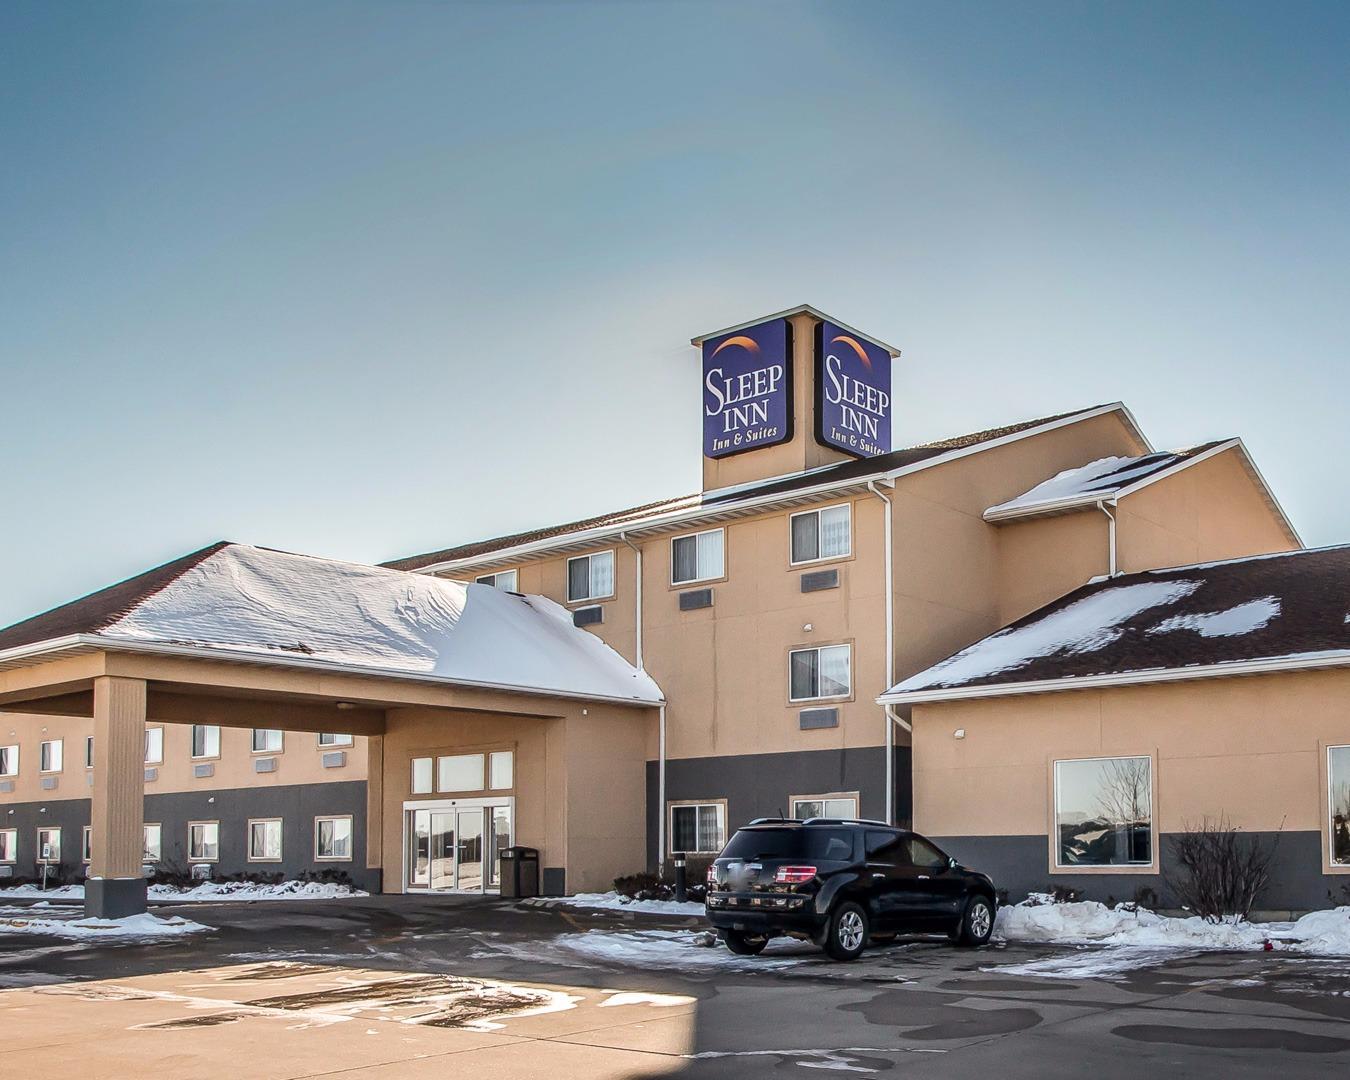 Sleep Inn & Suites, Mount Vernon IA